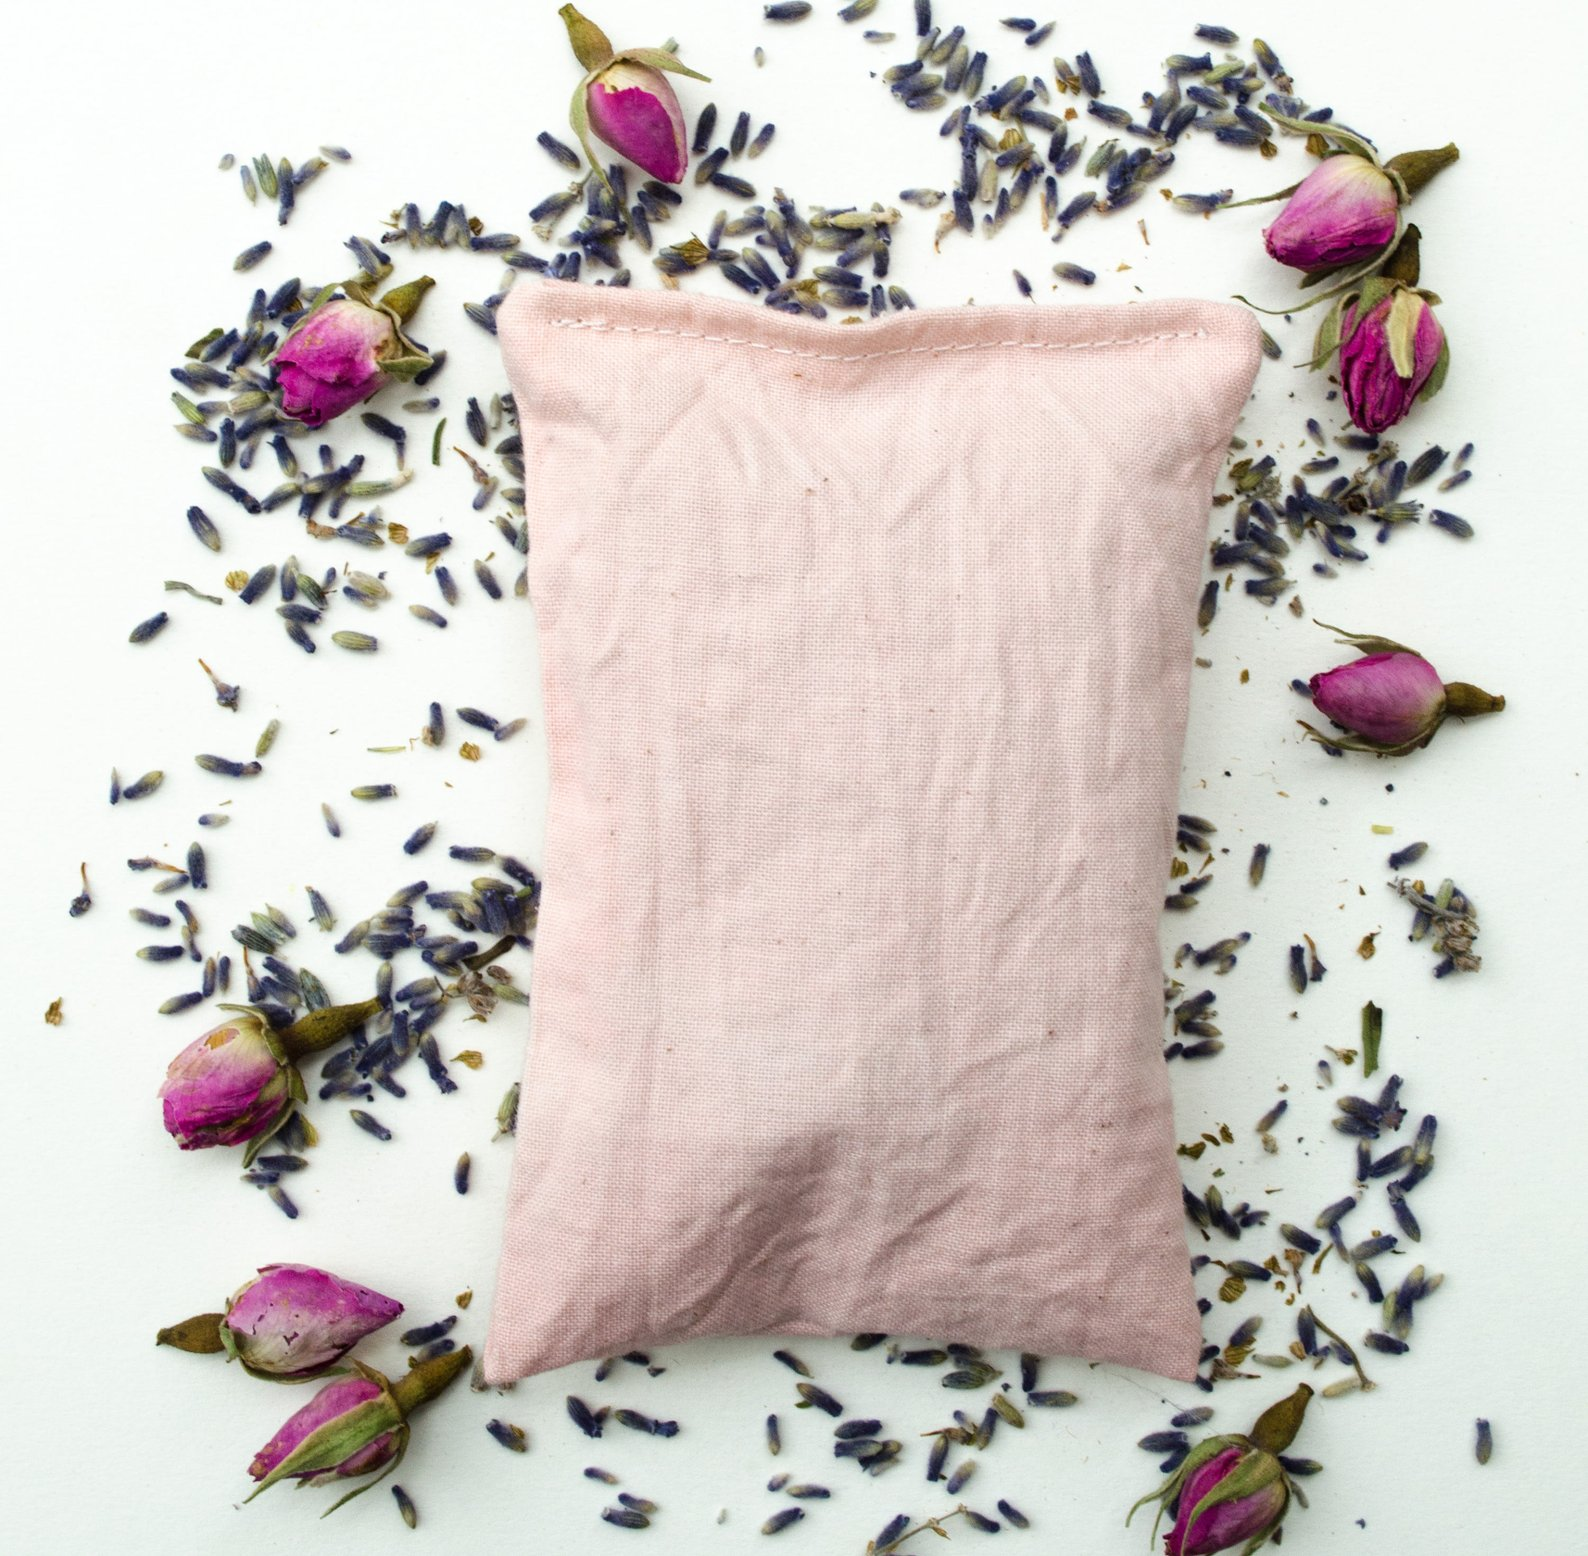 Herbal Sleep Sachet By La Aquarelle